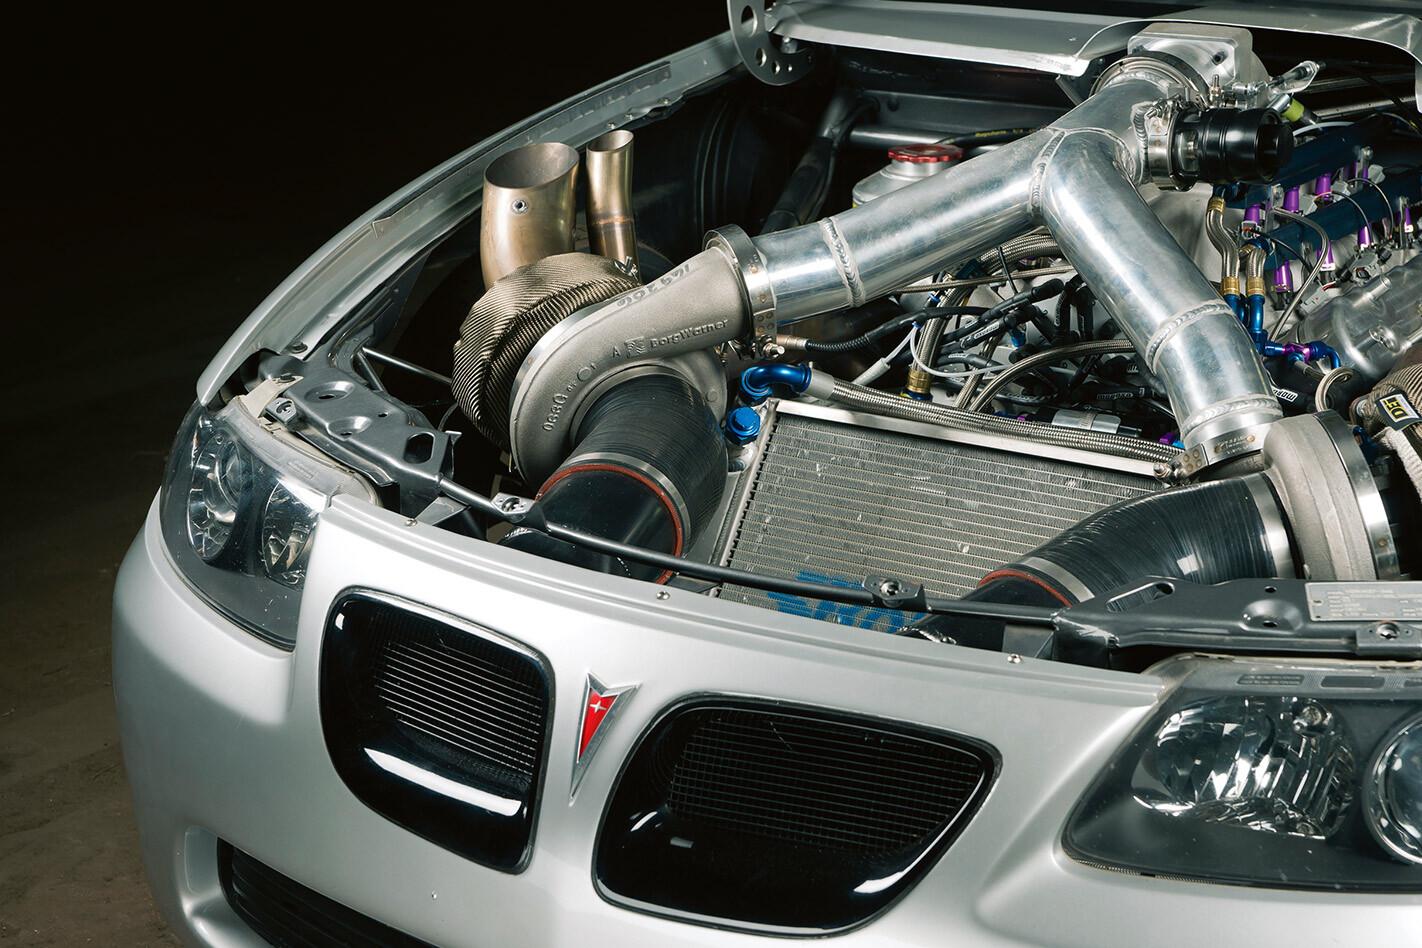 Pontiac GTO engine